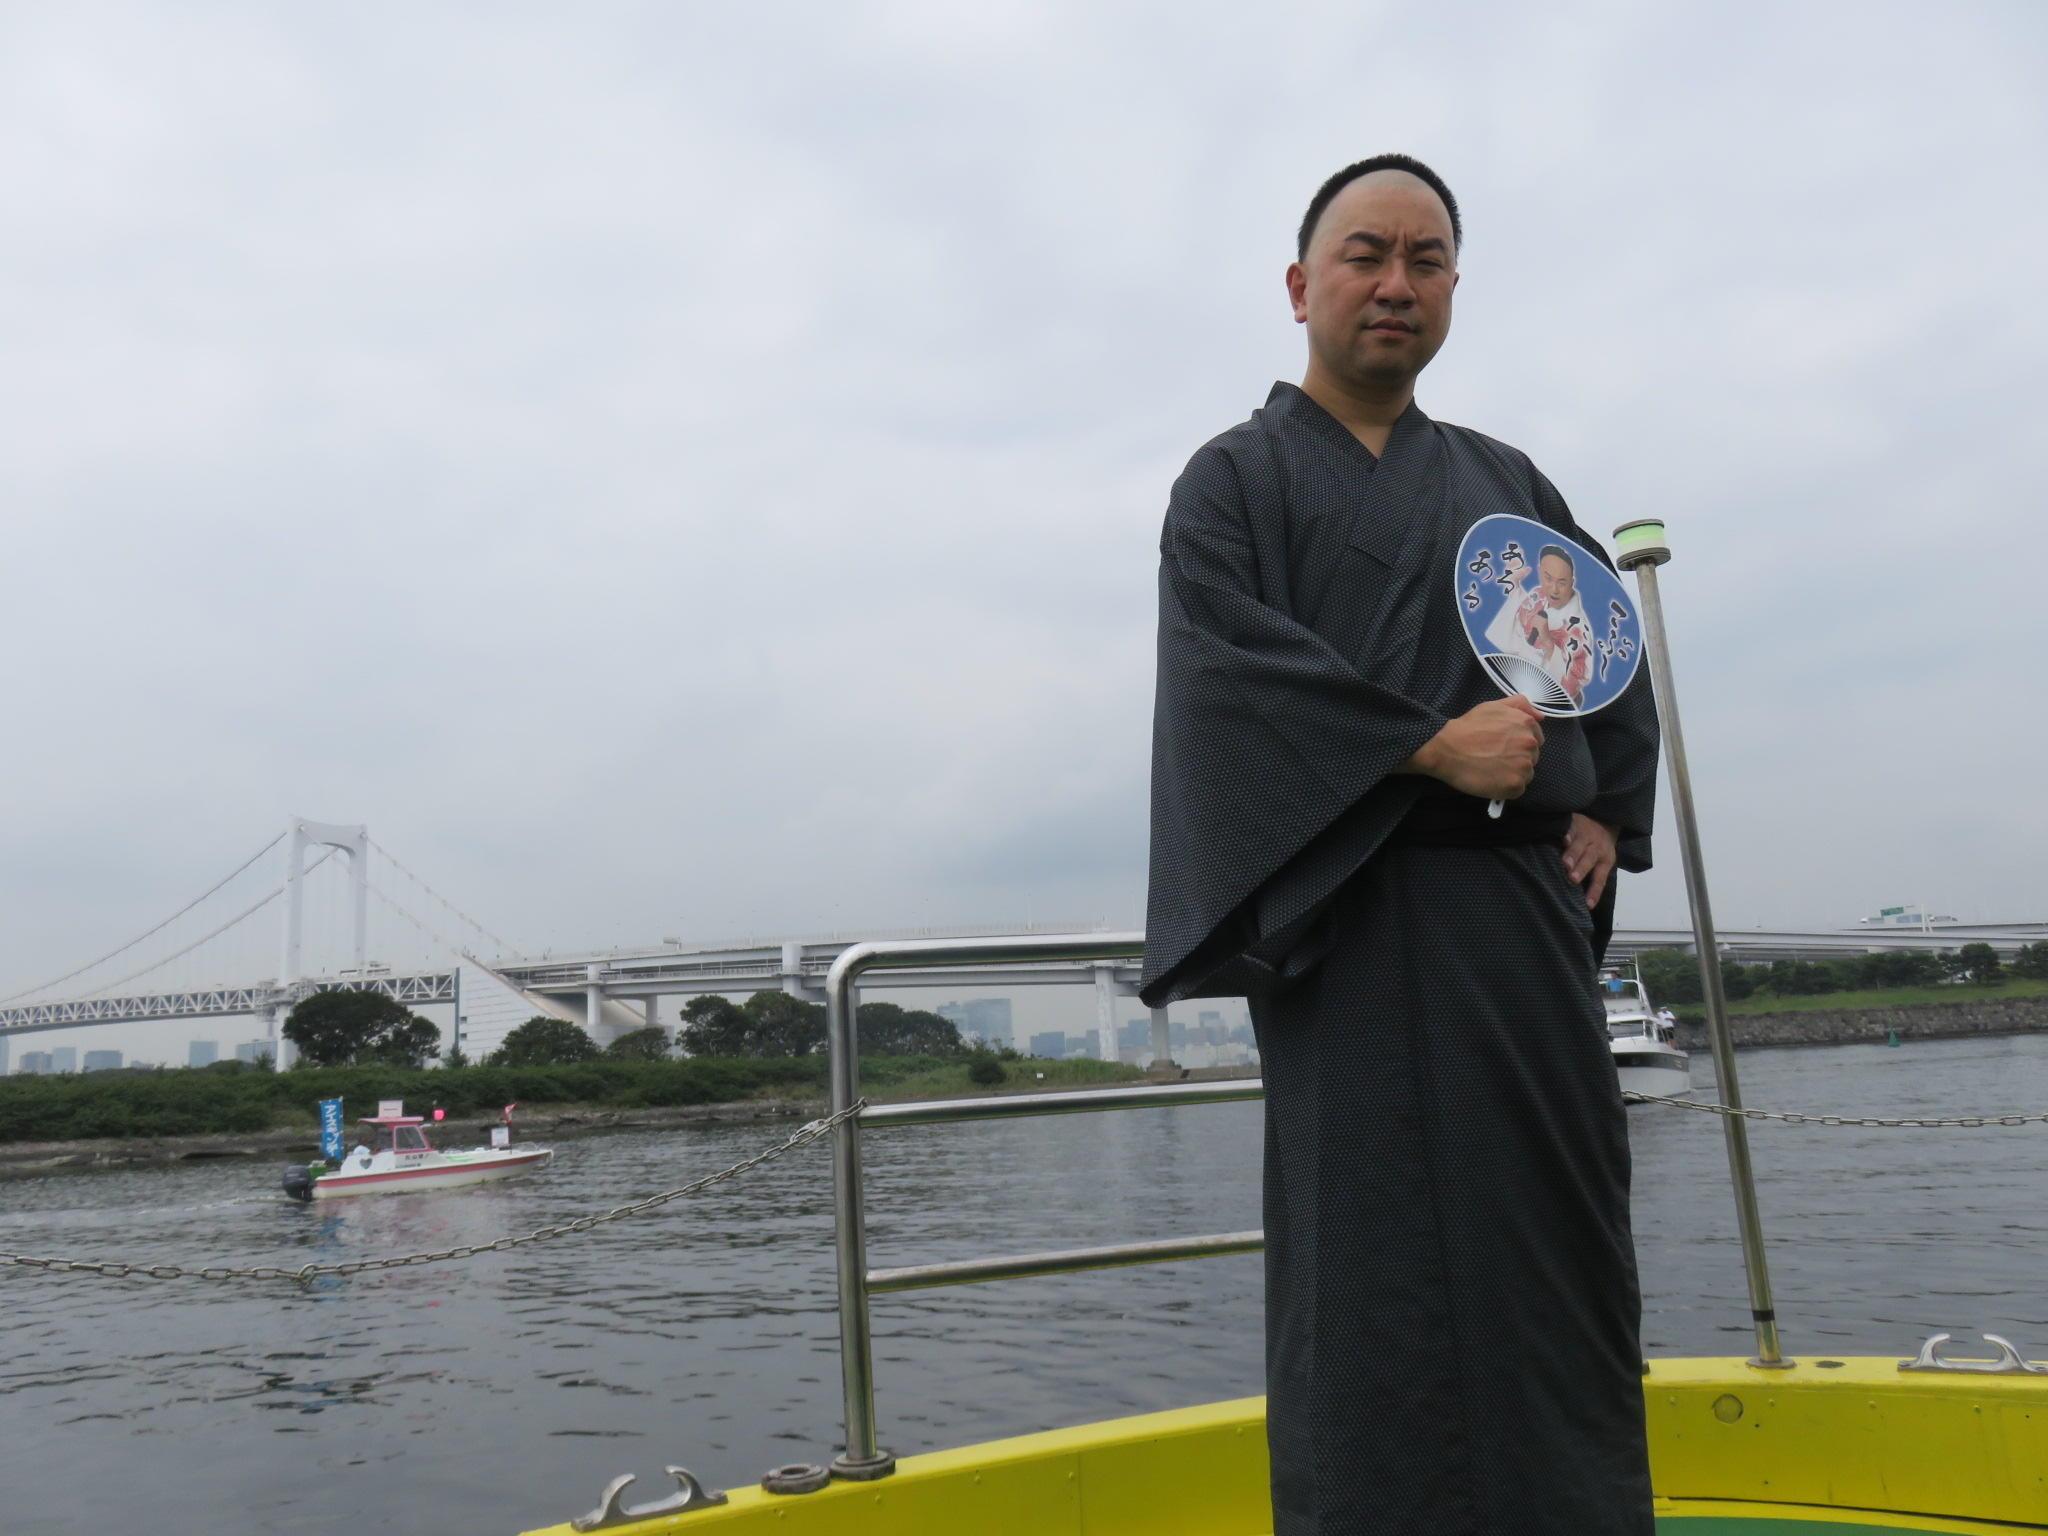 http://news.yoshimoto.co.jp/20170807125643-428408e803d07e5c07194ae29eebcf53657d46ba.jpg